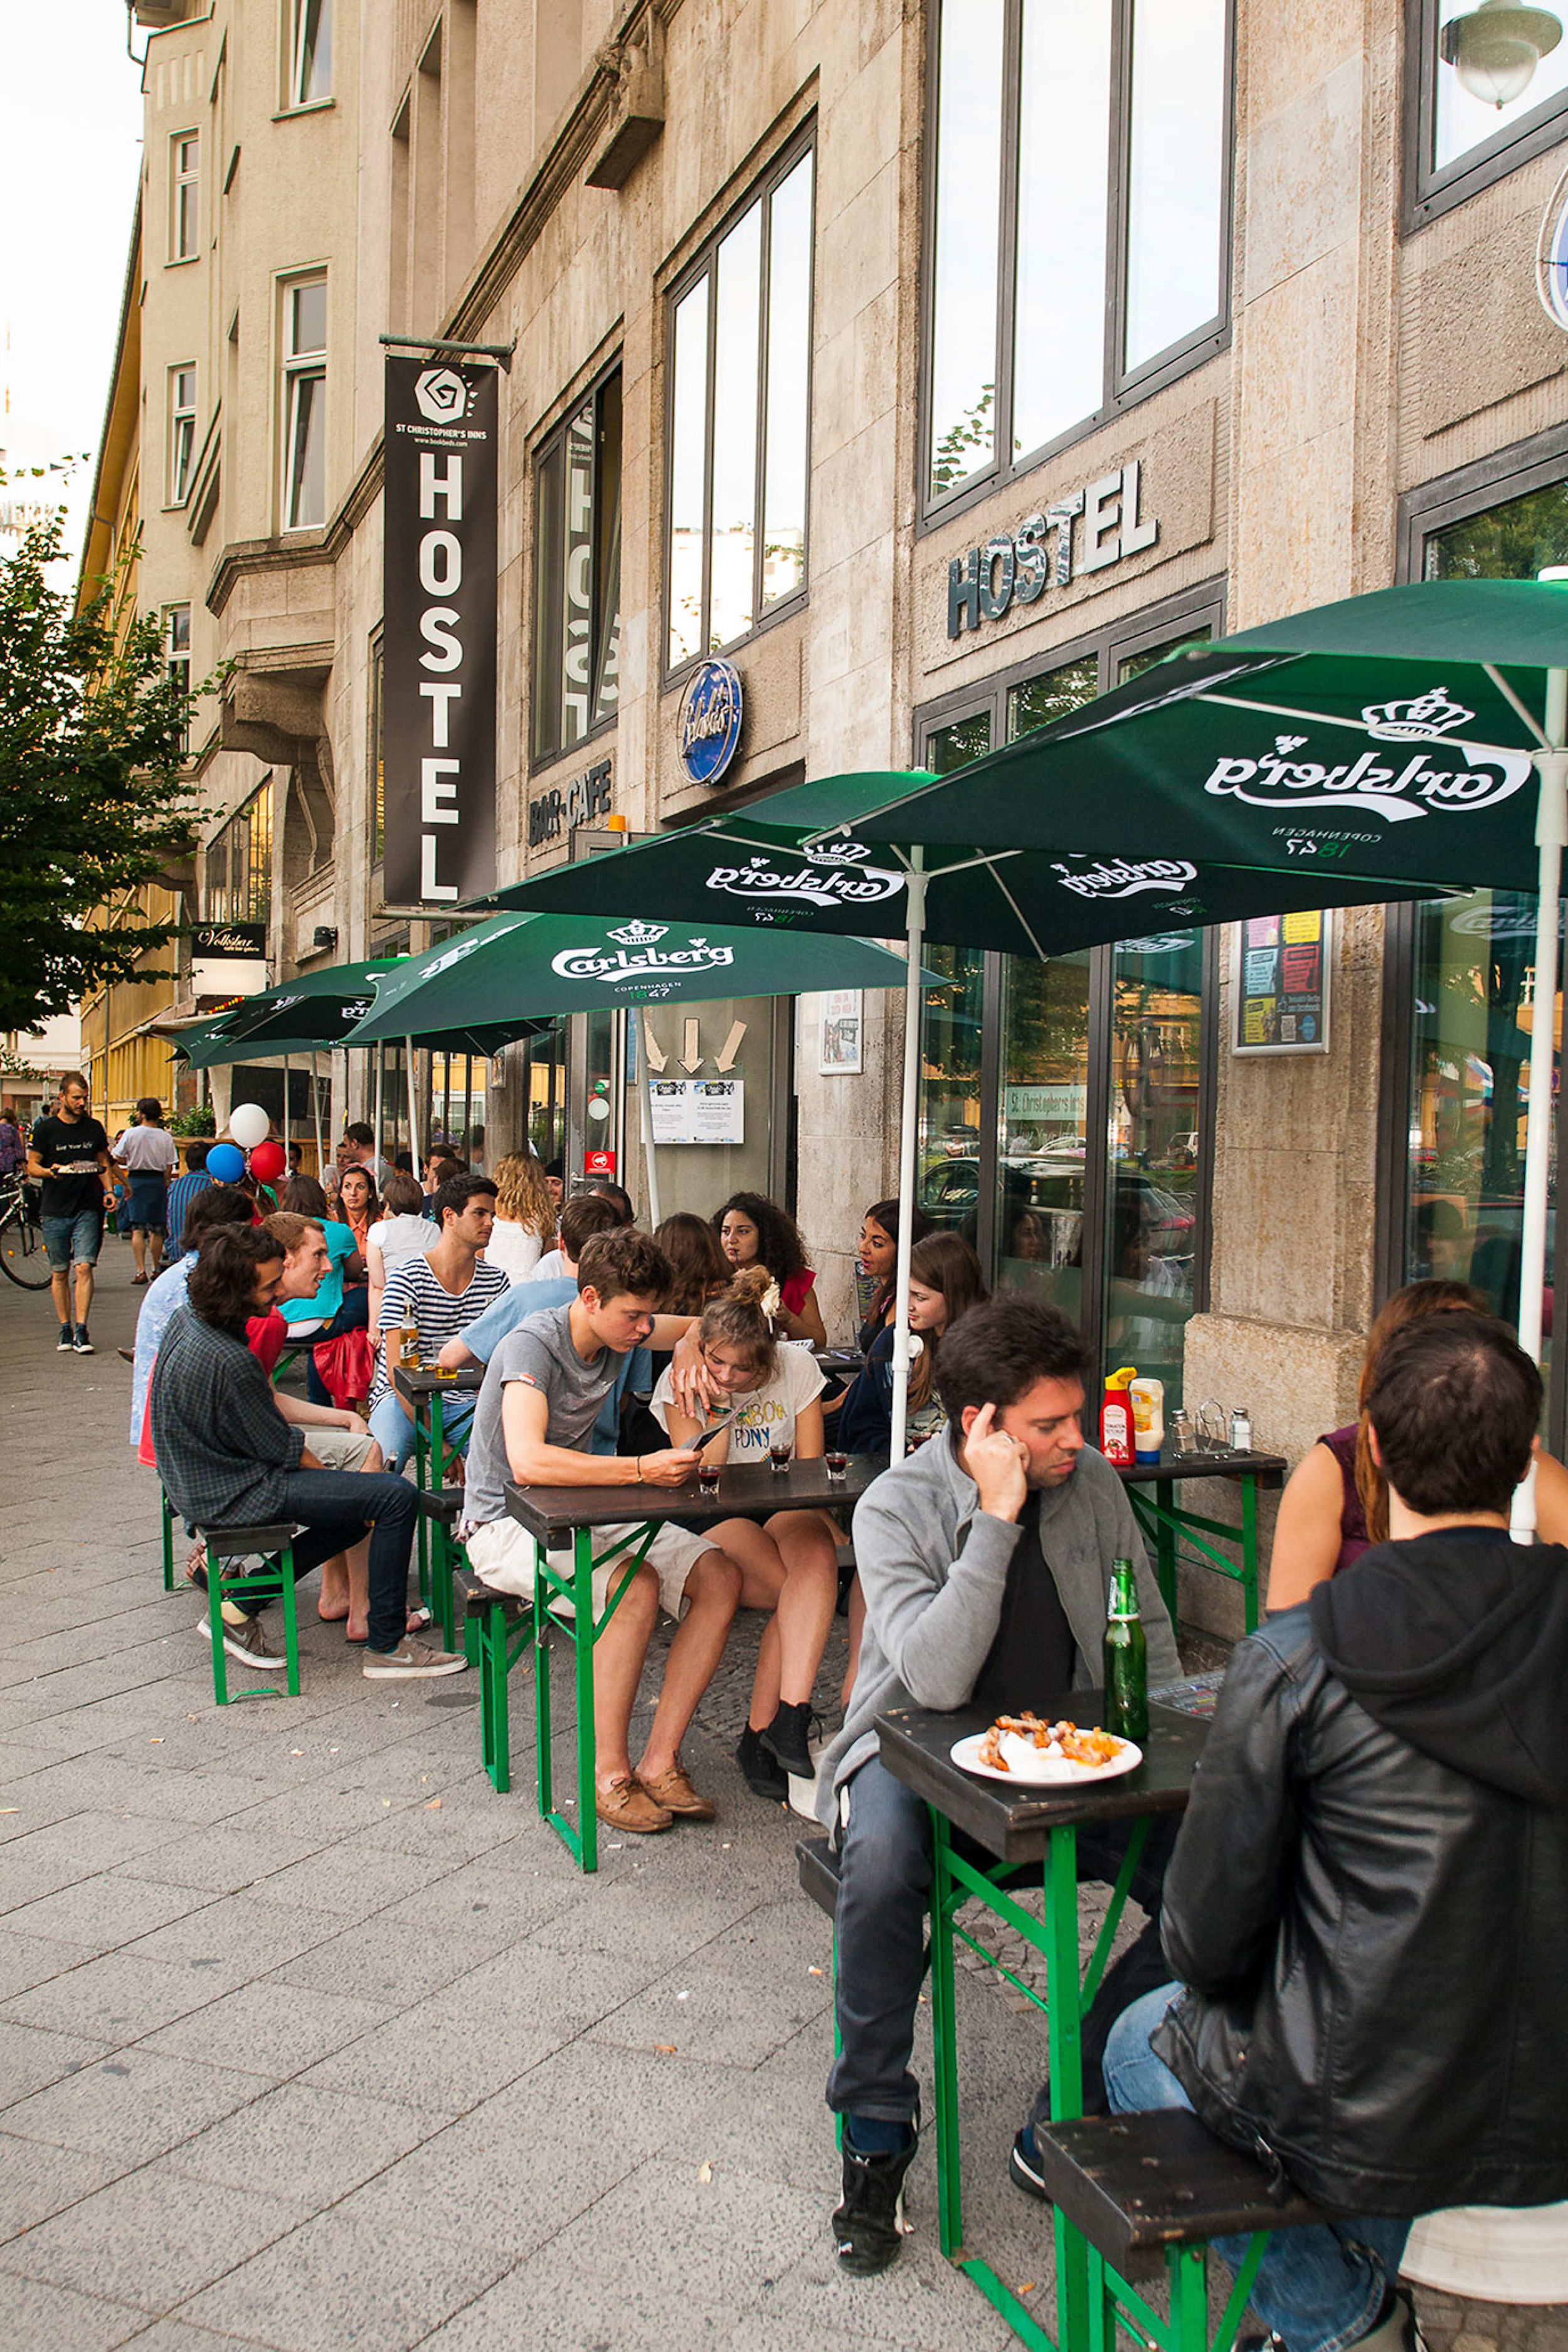 HOSTEL - St Christopher's Berlin Alexanderplatz